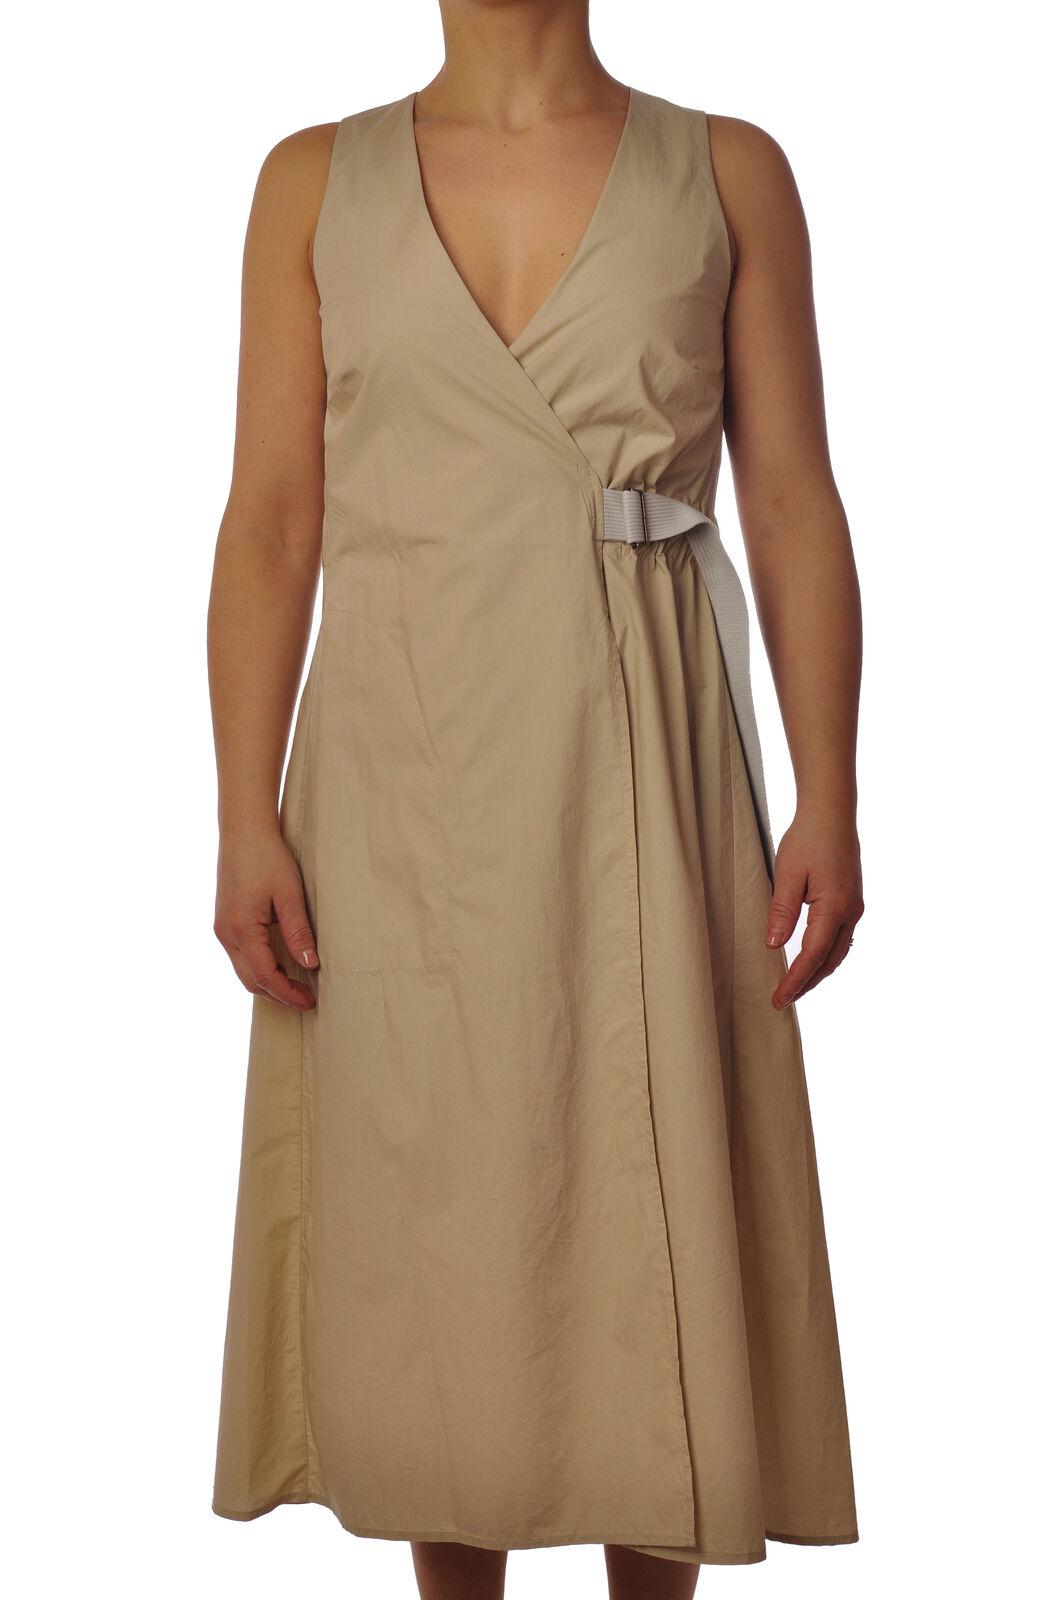 2017 - Dresses-Dress - Woman - Beige - 3386215G184330